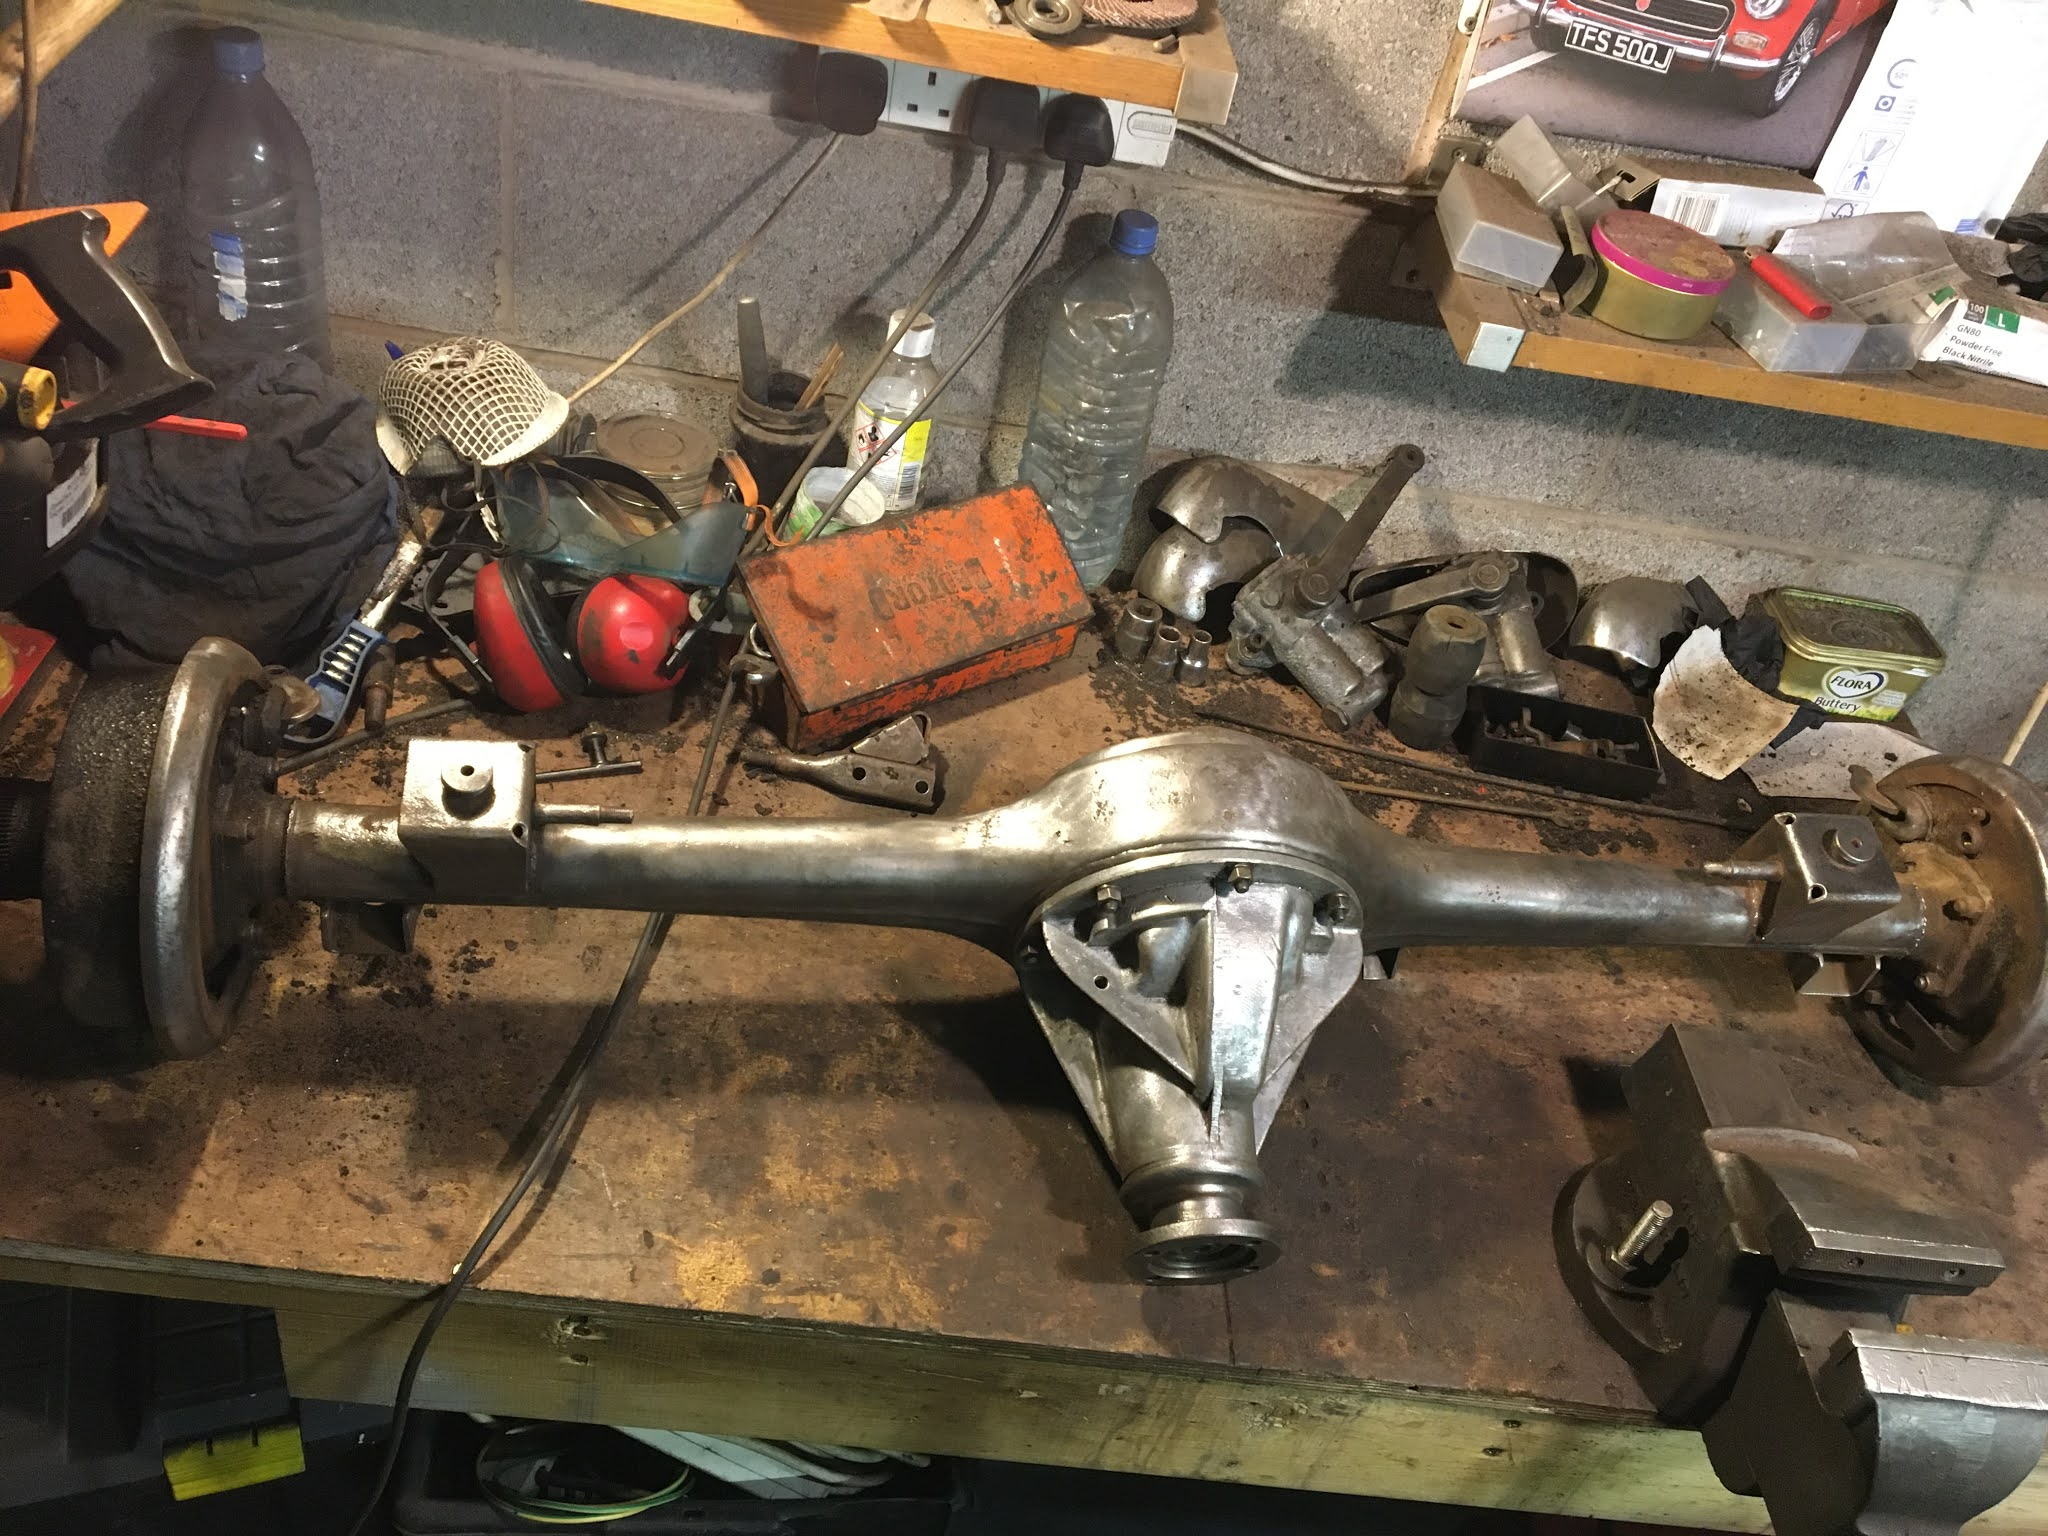 MG Midget 1965 MKII Restoration Project: Carb Clean Up